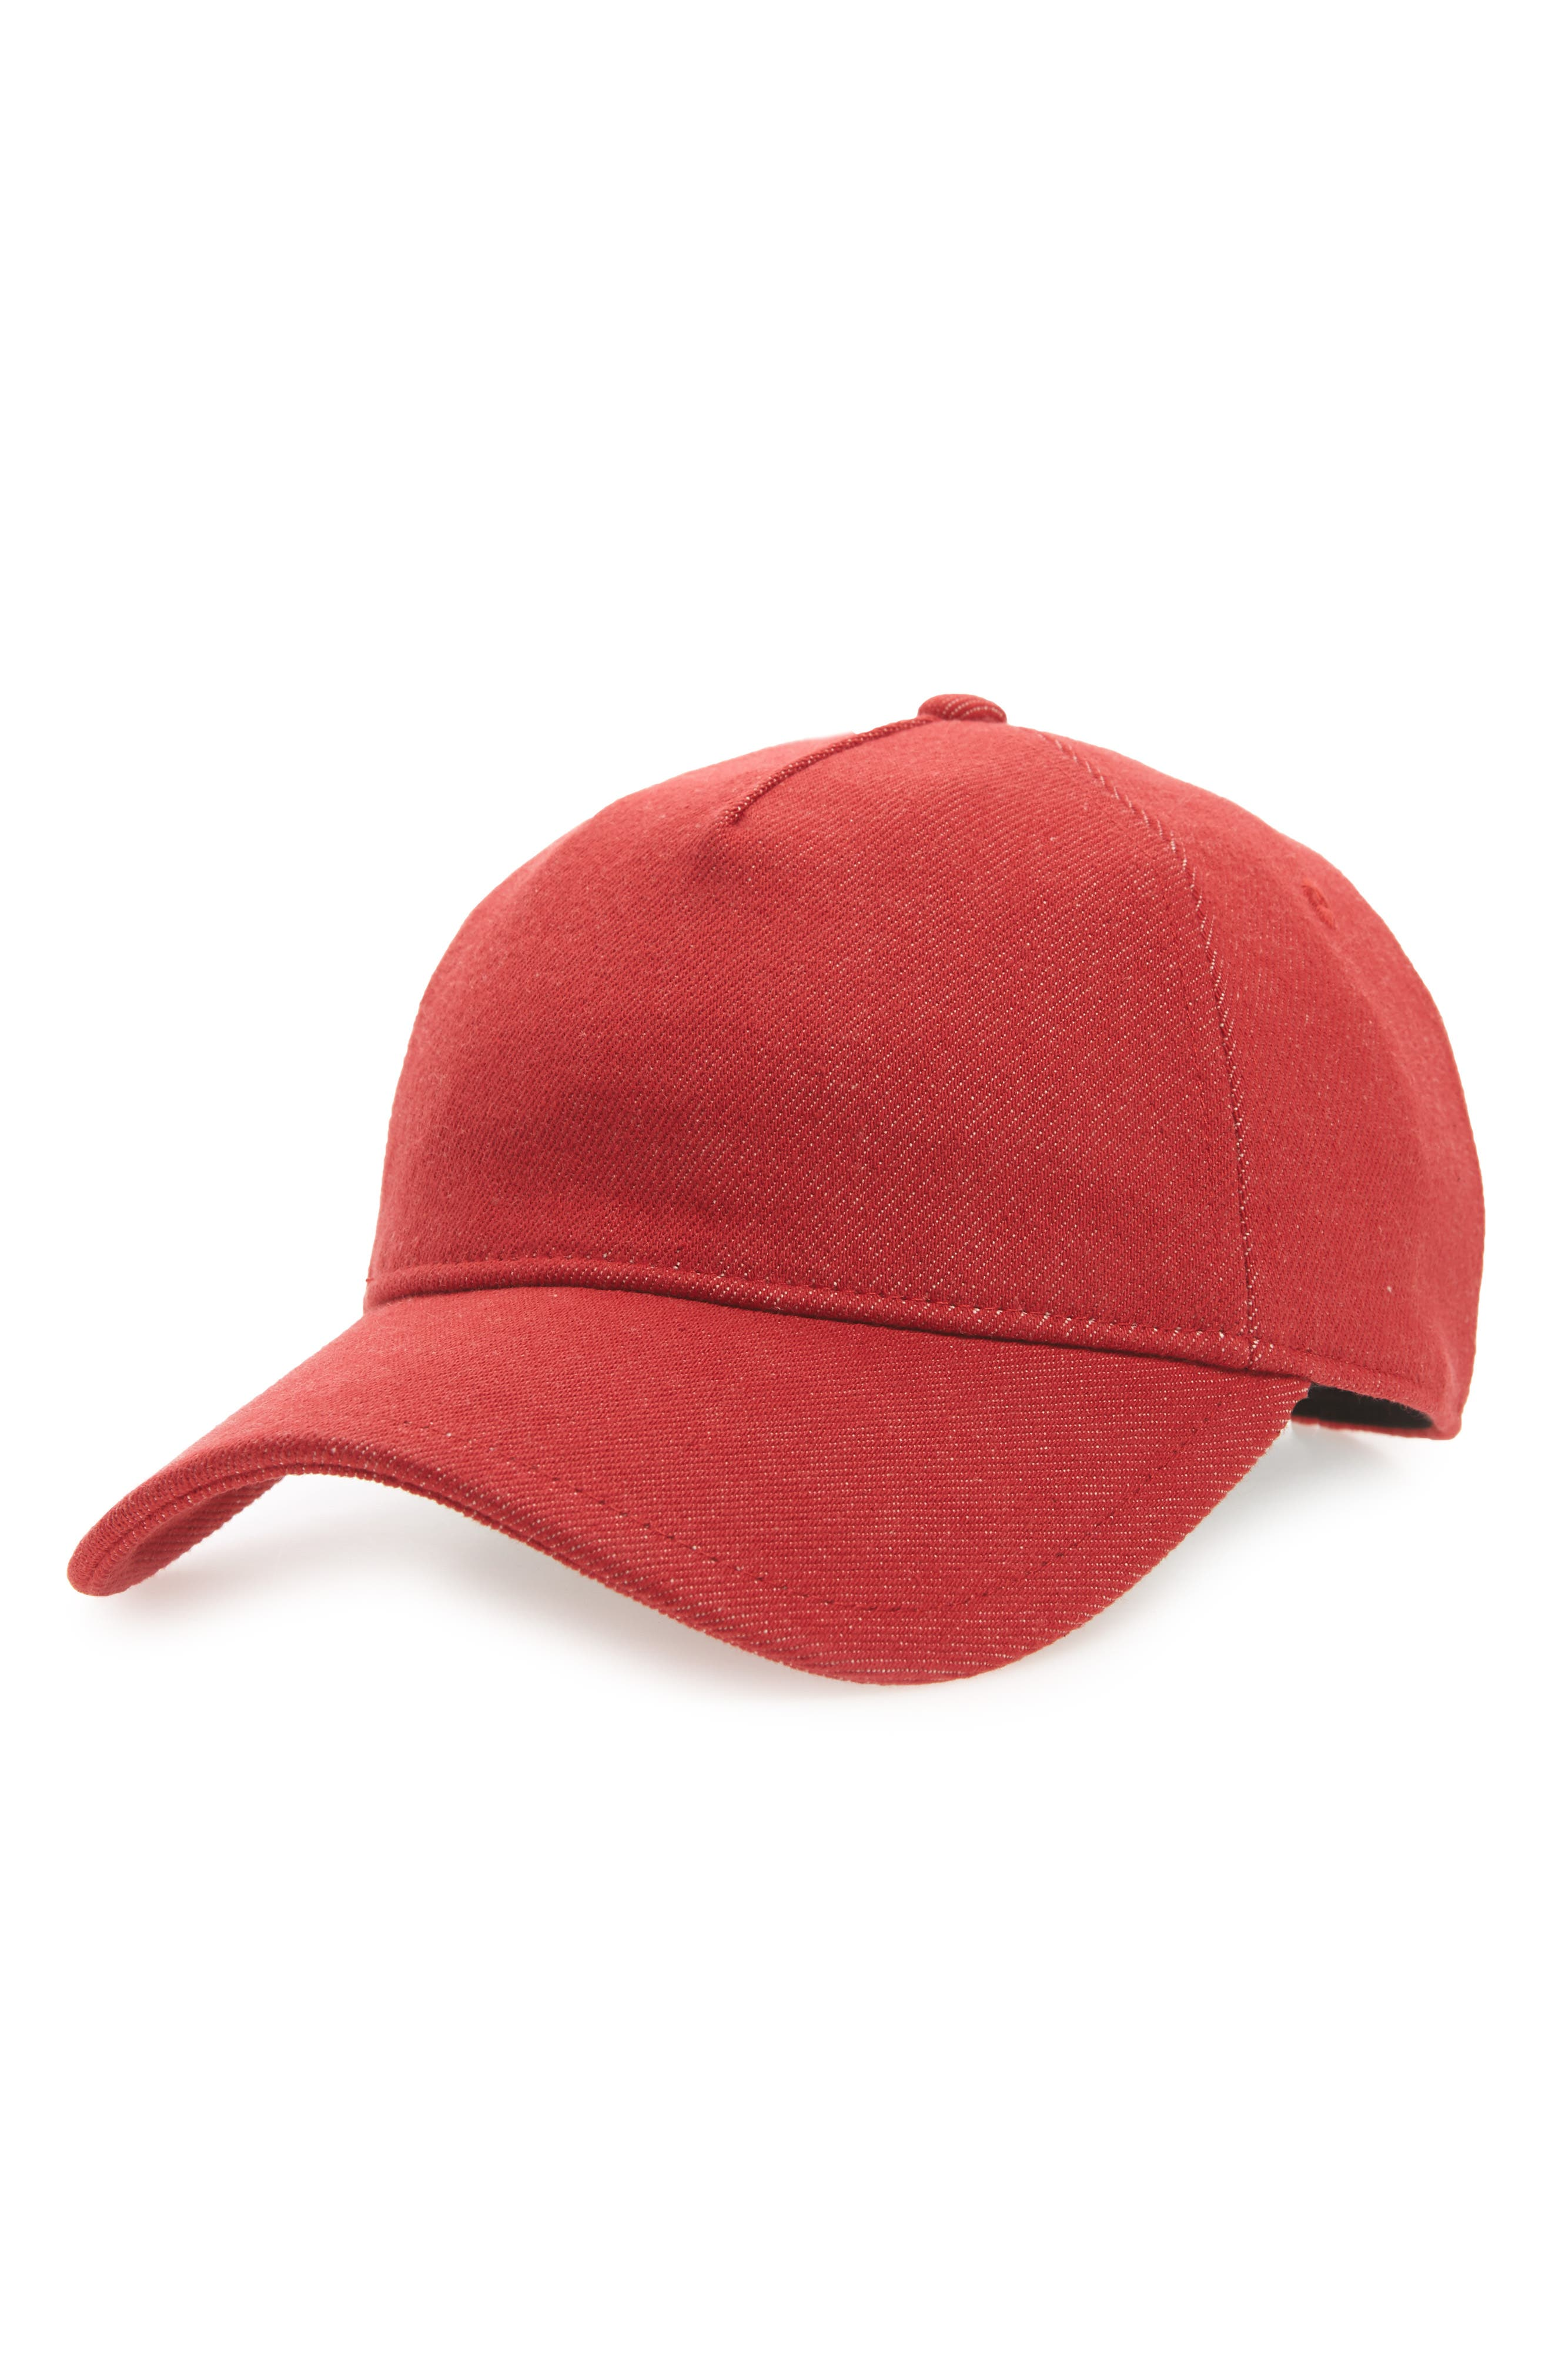 Marilyn Baseball Cap,                             Main thumbnail 1, color,                             Red